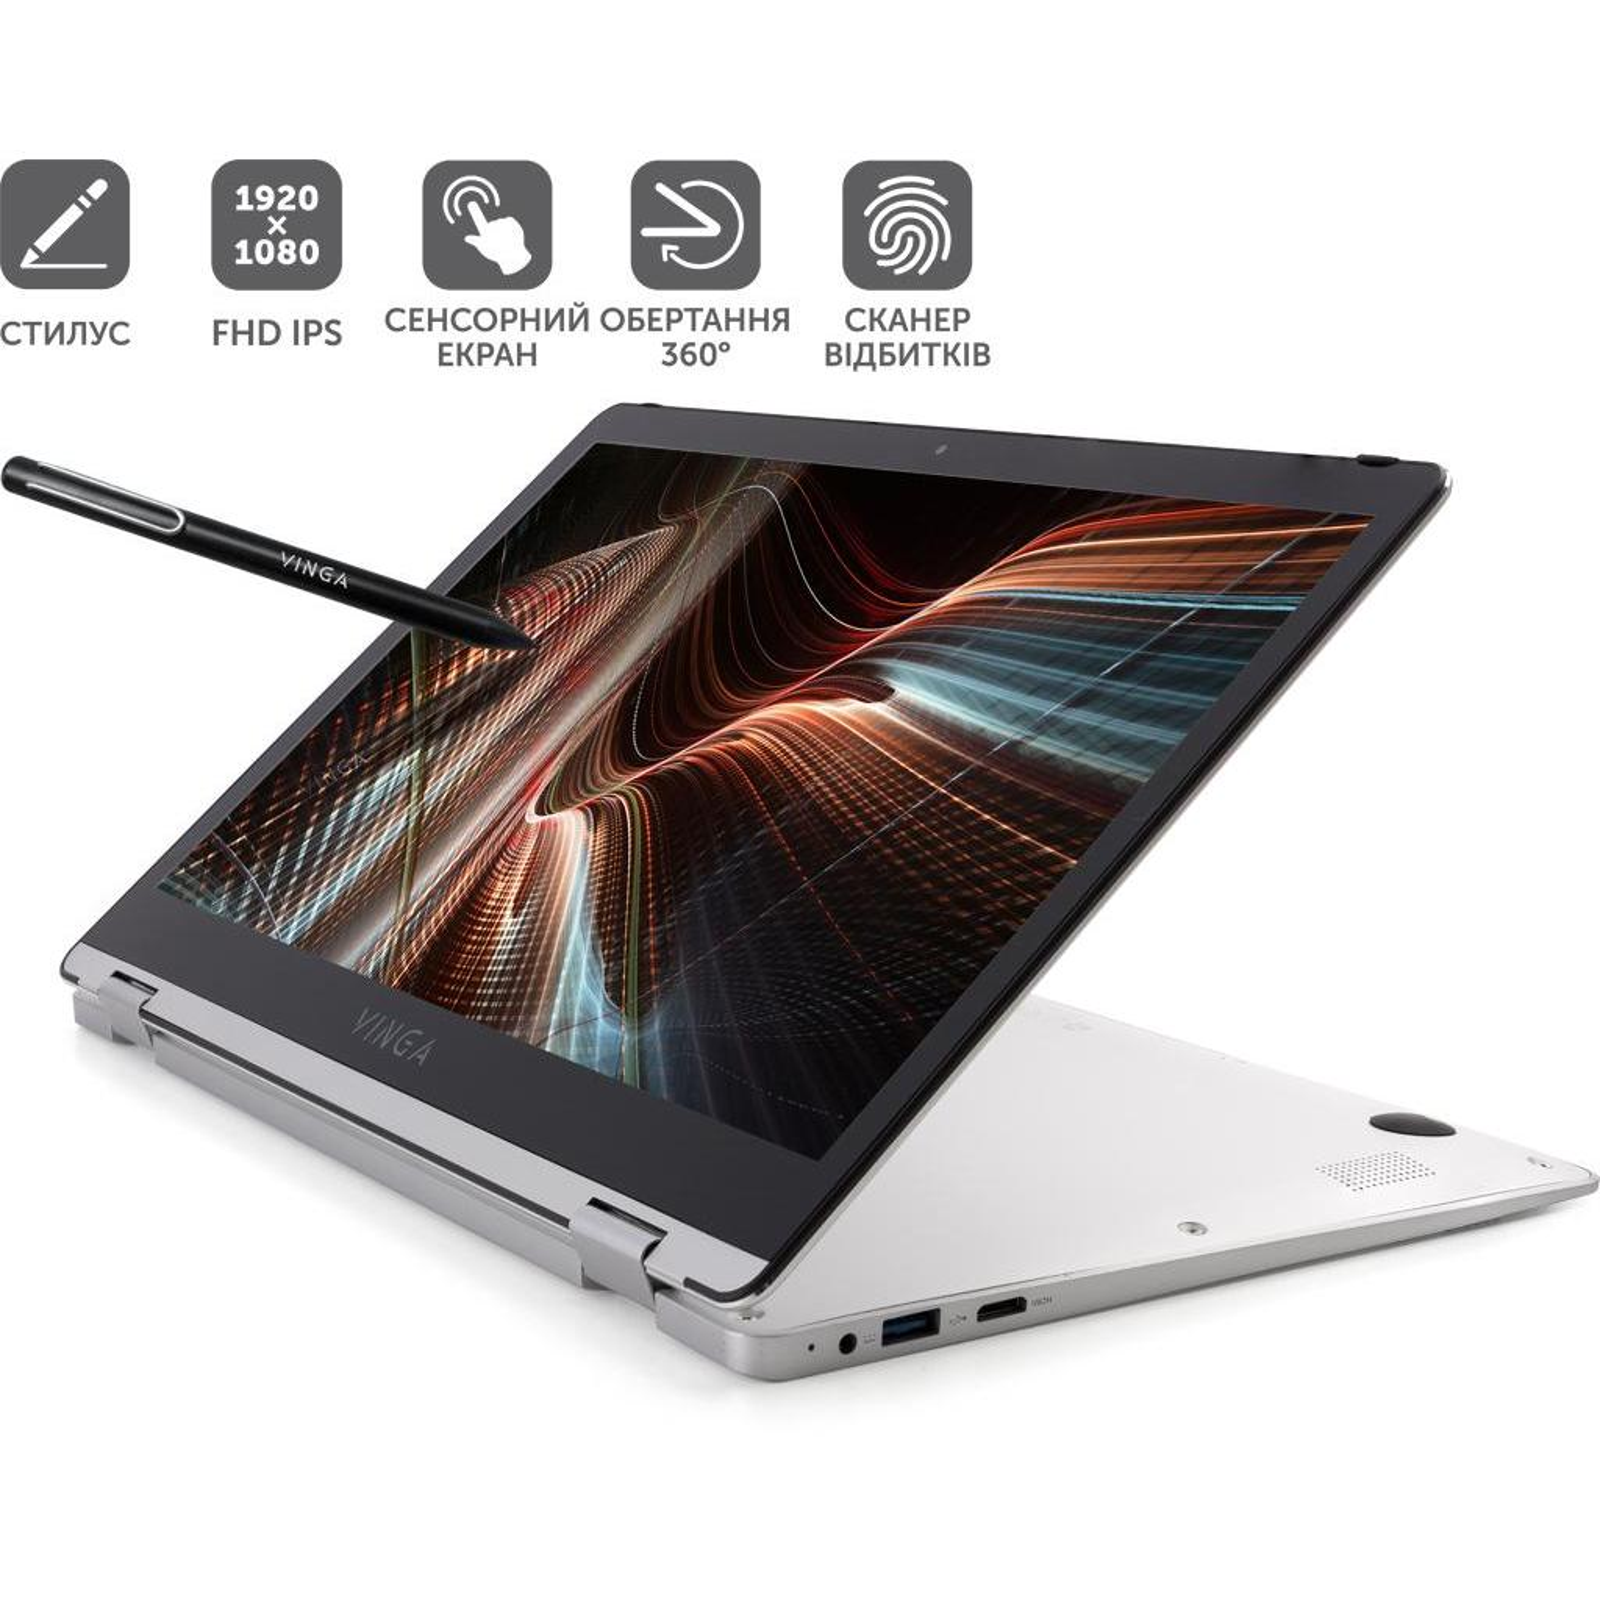 Ноутбук Vinga Twizzle Pen J133 (J133-C33464PS) изображение 2